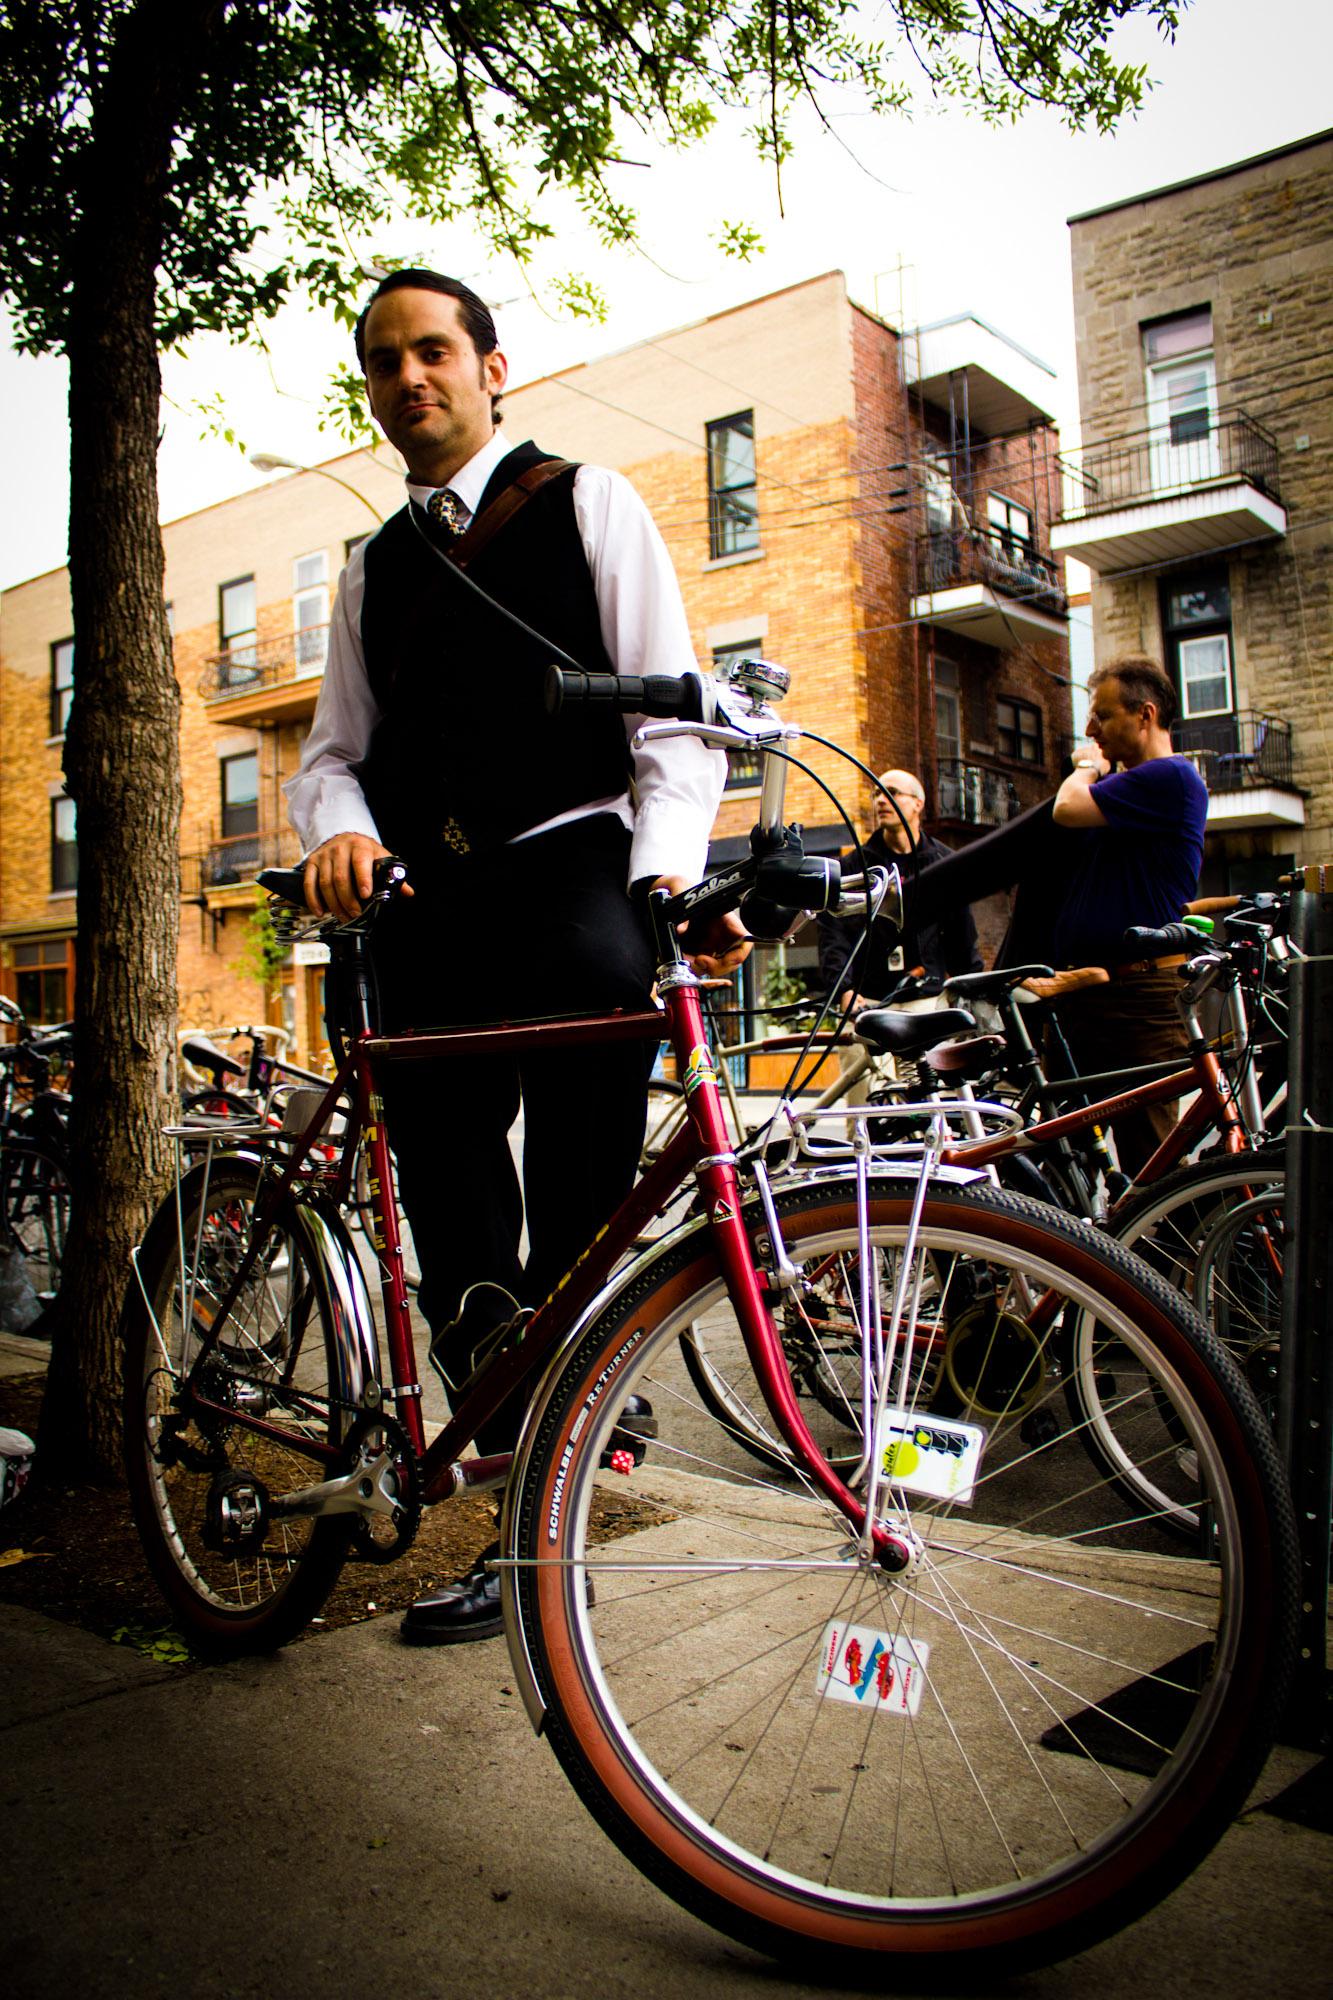 Montreal Cycle Chic: rencontre de bikers au bar Waverly